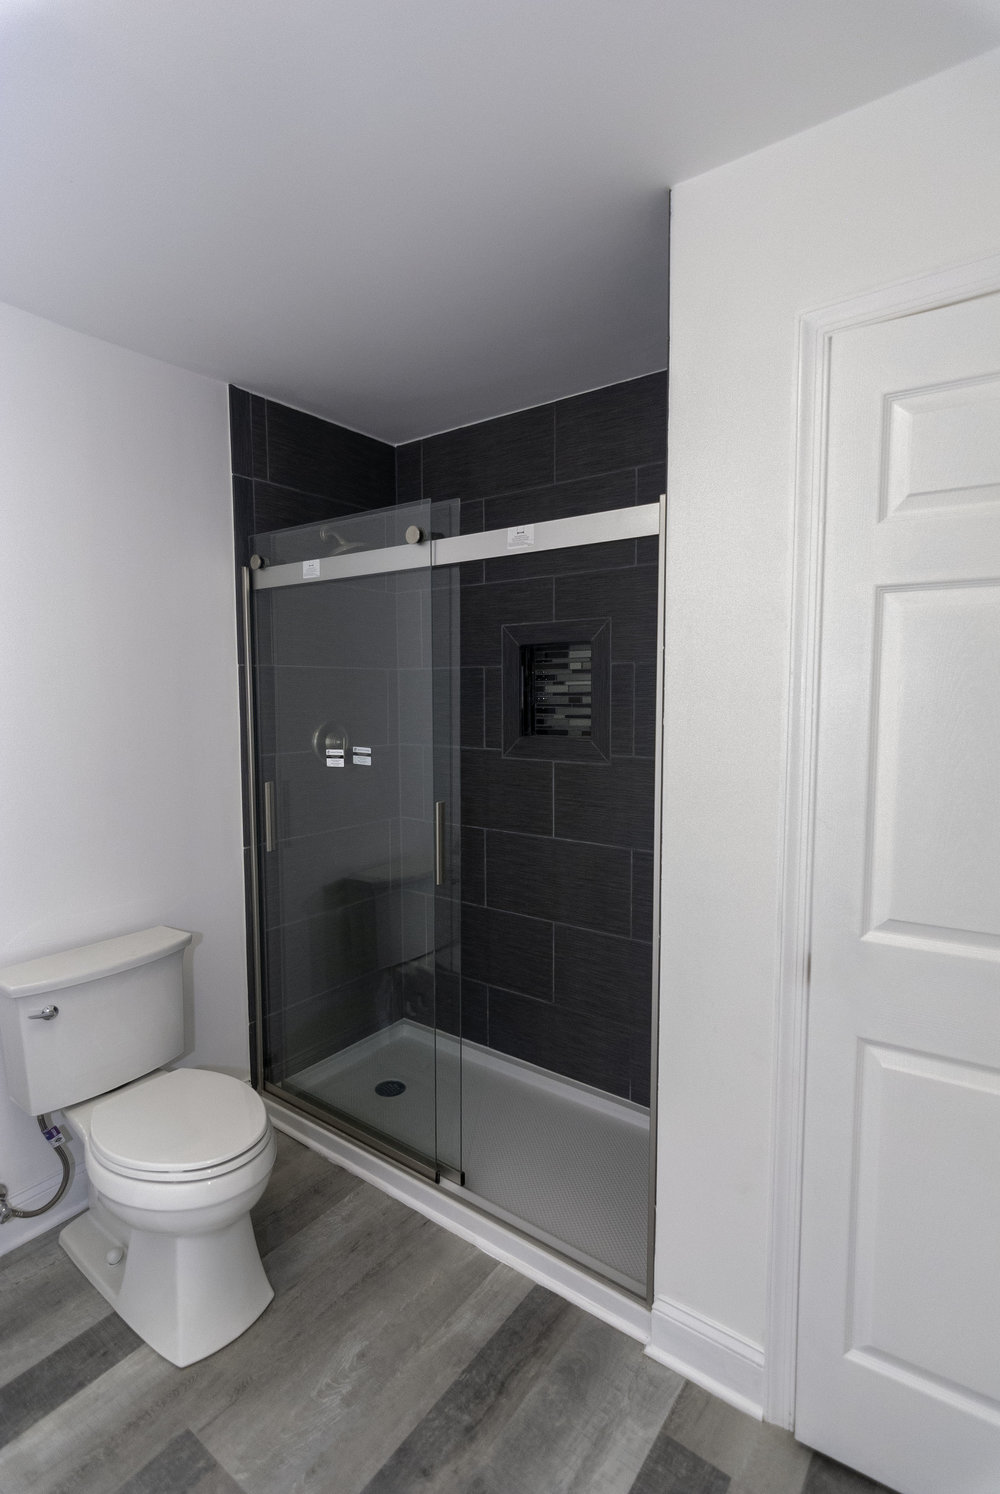 6 Harness Basement Bathroom 1.jpg